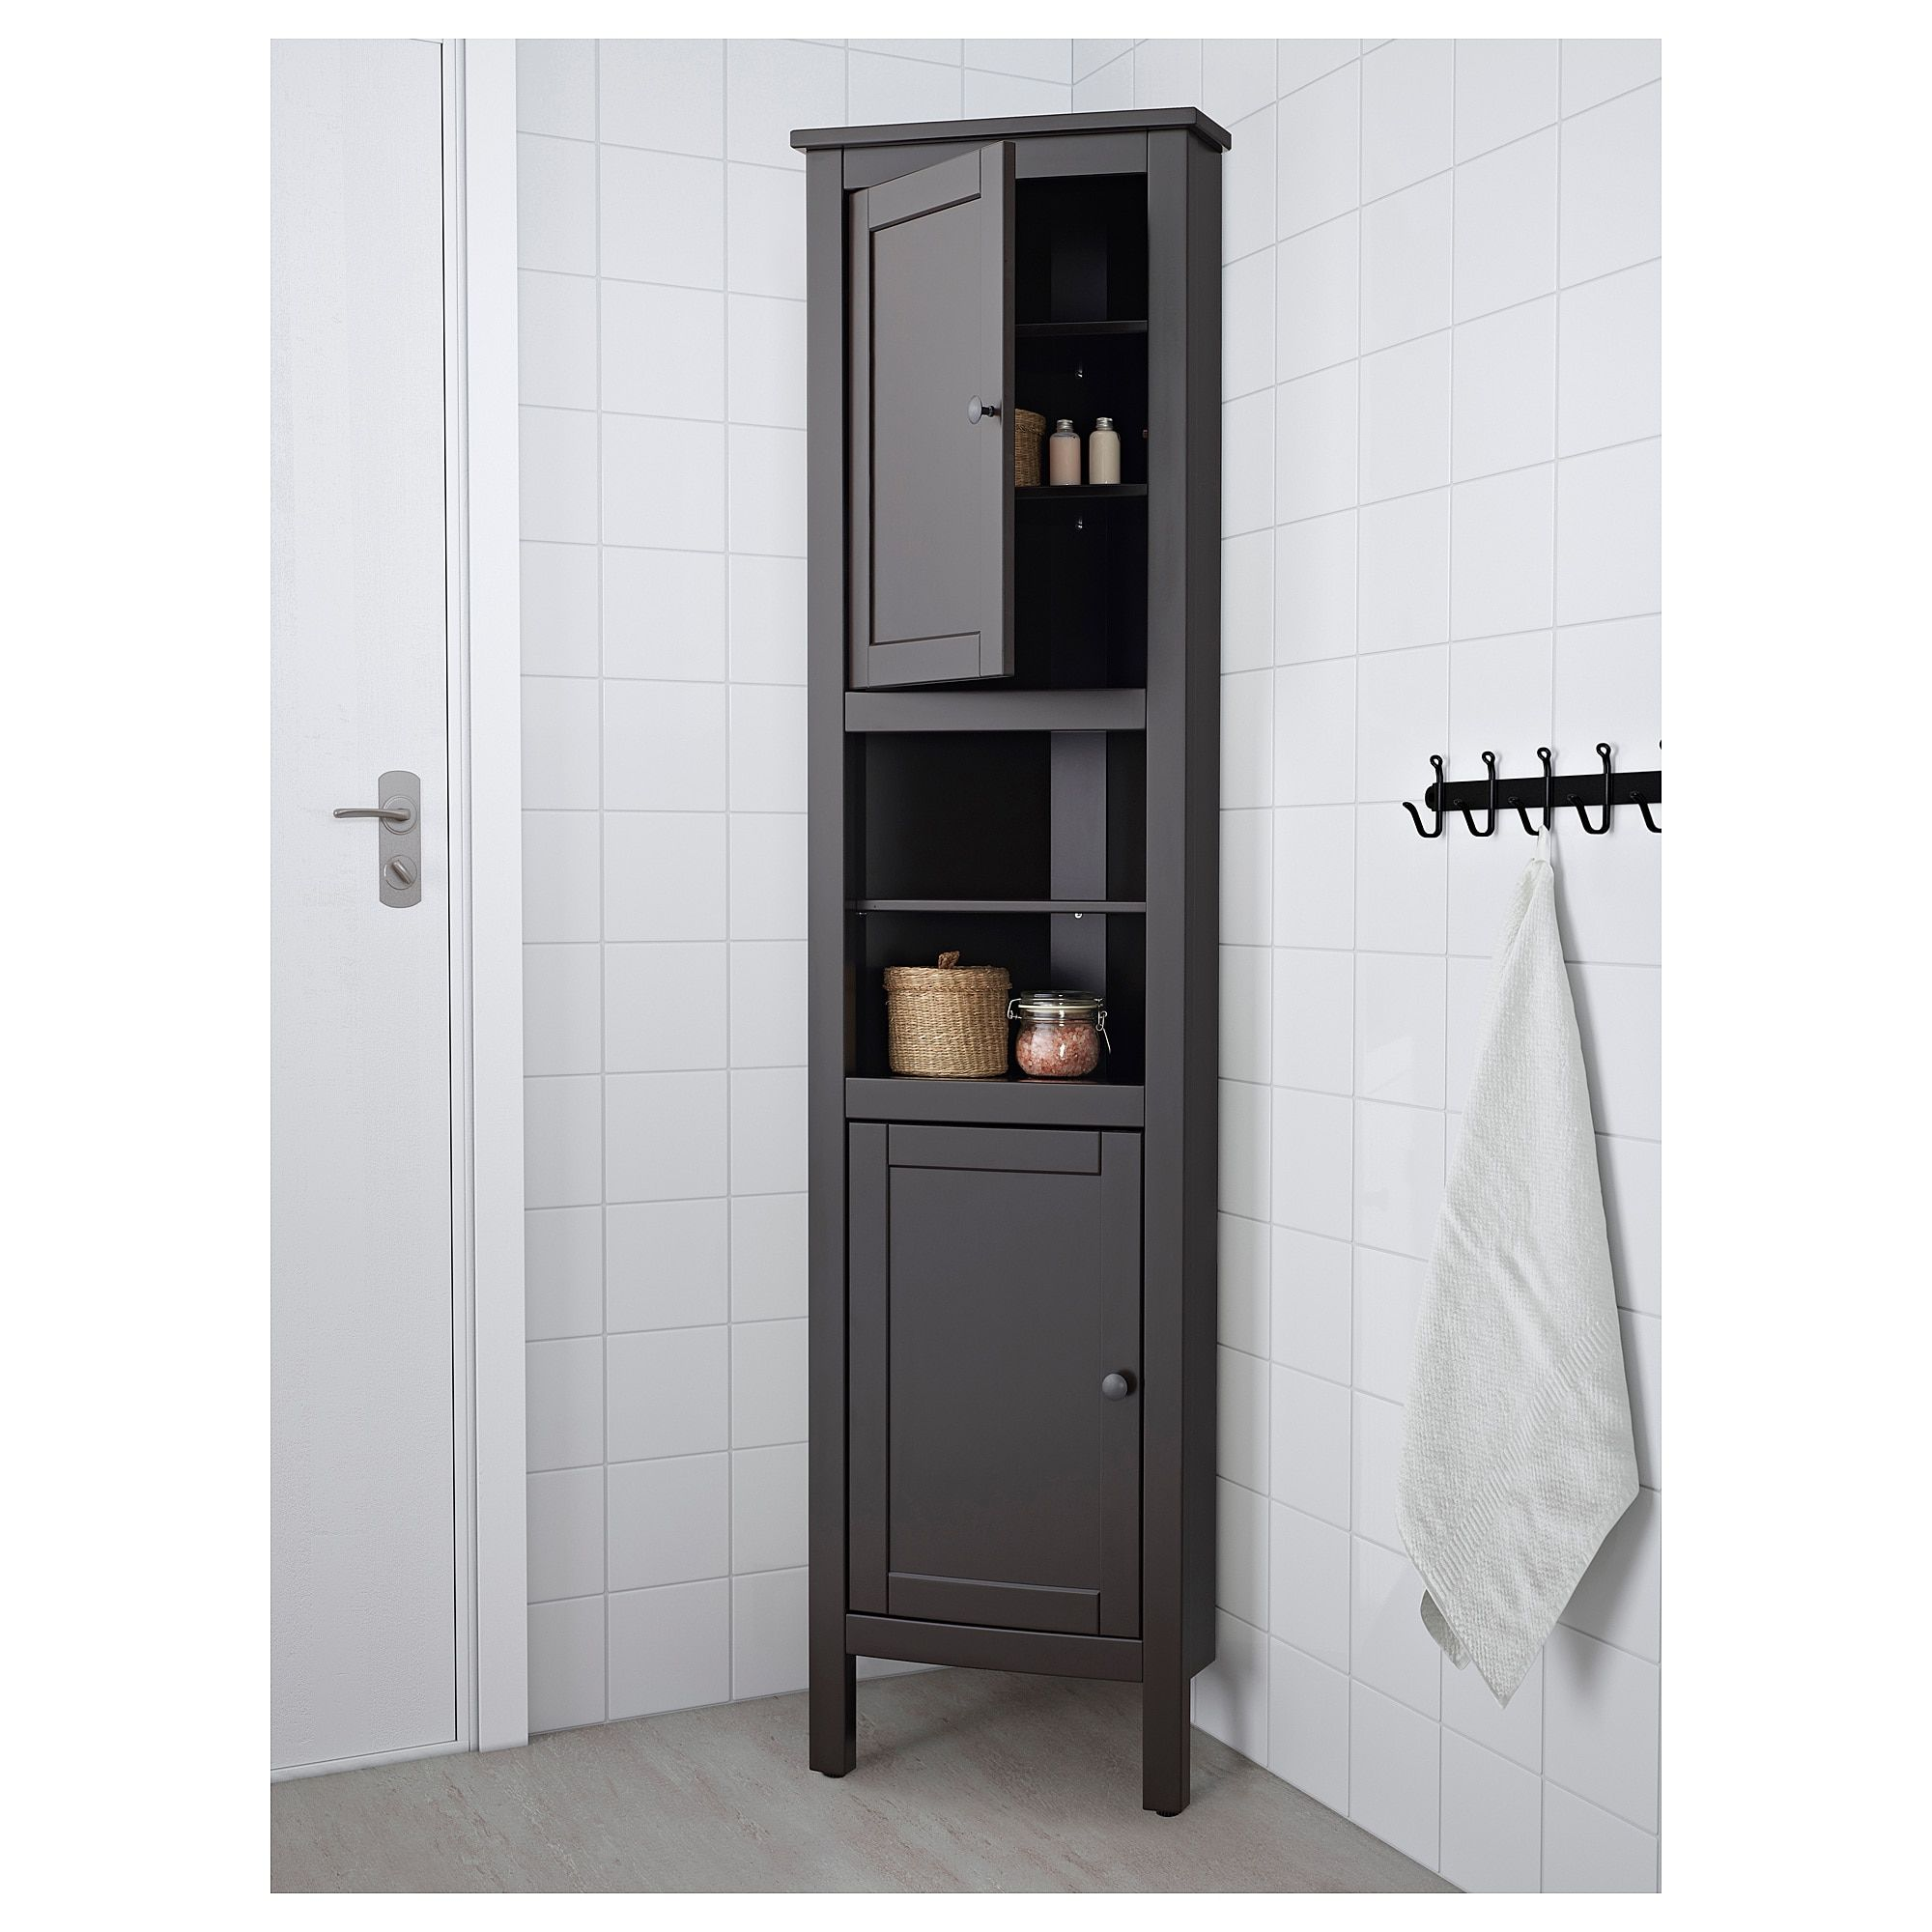 Hemnes Corner Cabinet Black Brown 20 1 2x14 5 8x78 3 8 In 2020